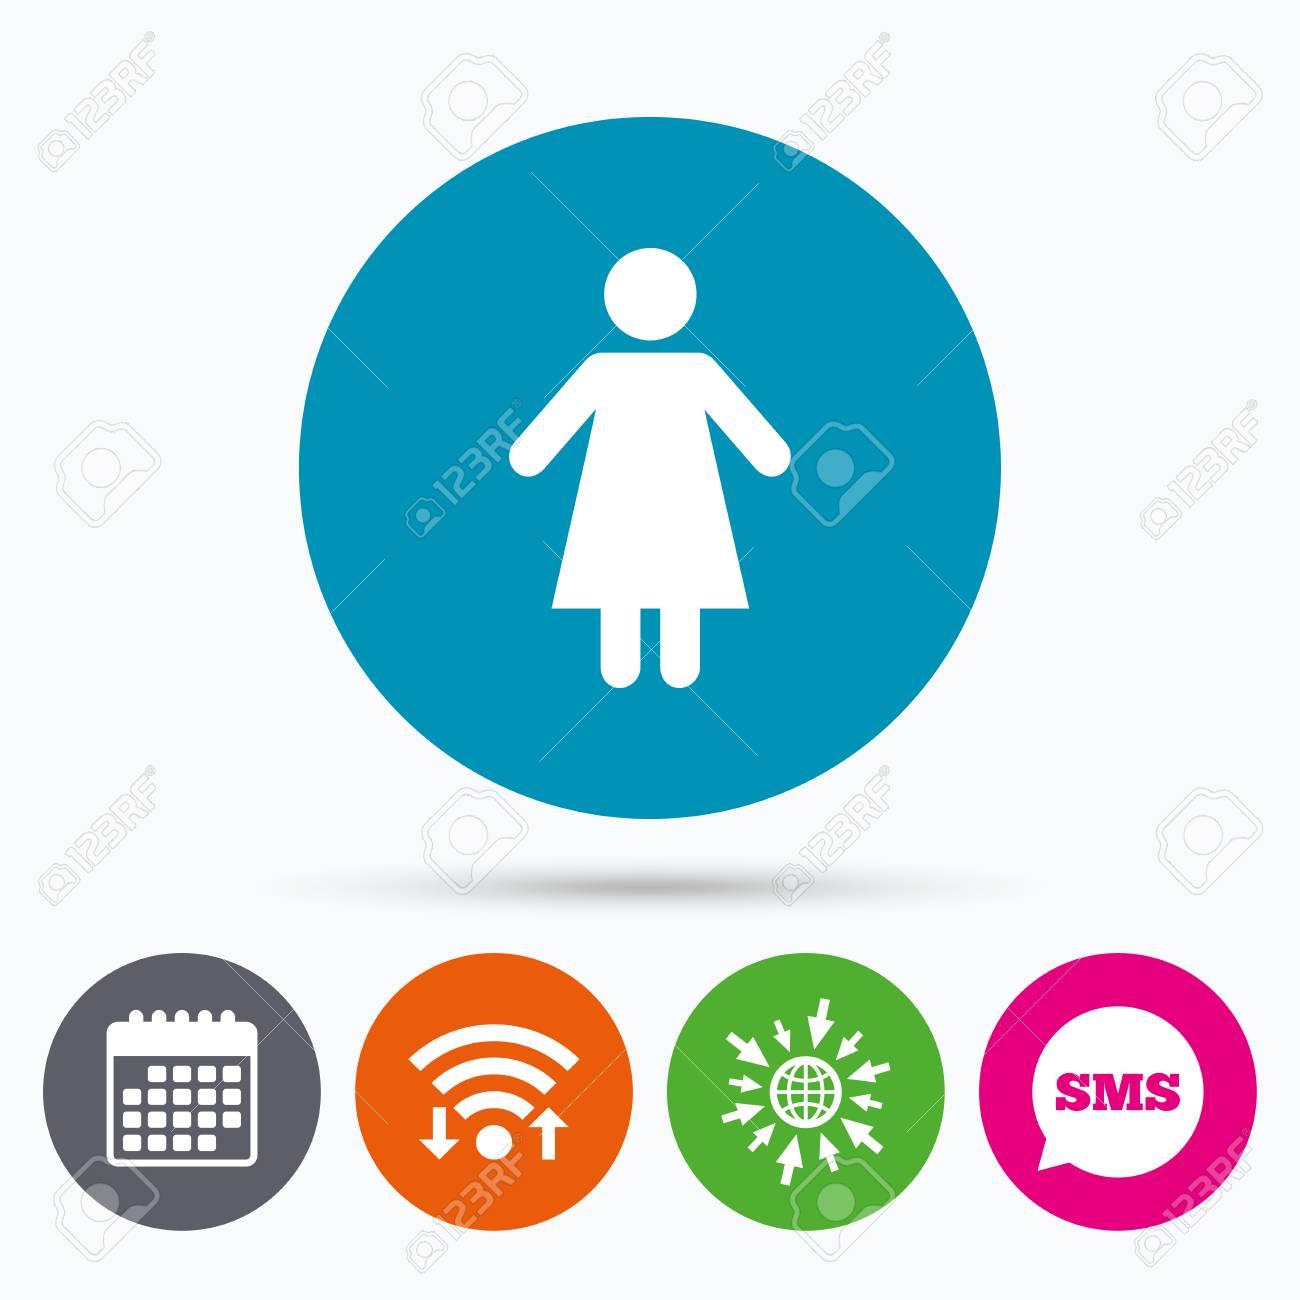 Icônes Wifi Sms Et Calendrier Icône De Signe Féminin Symbole